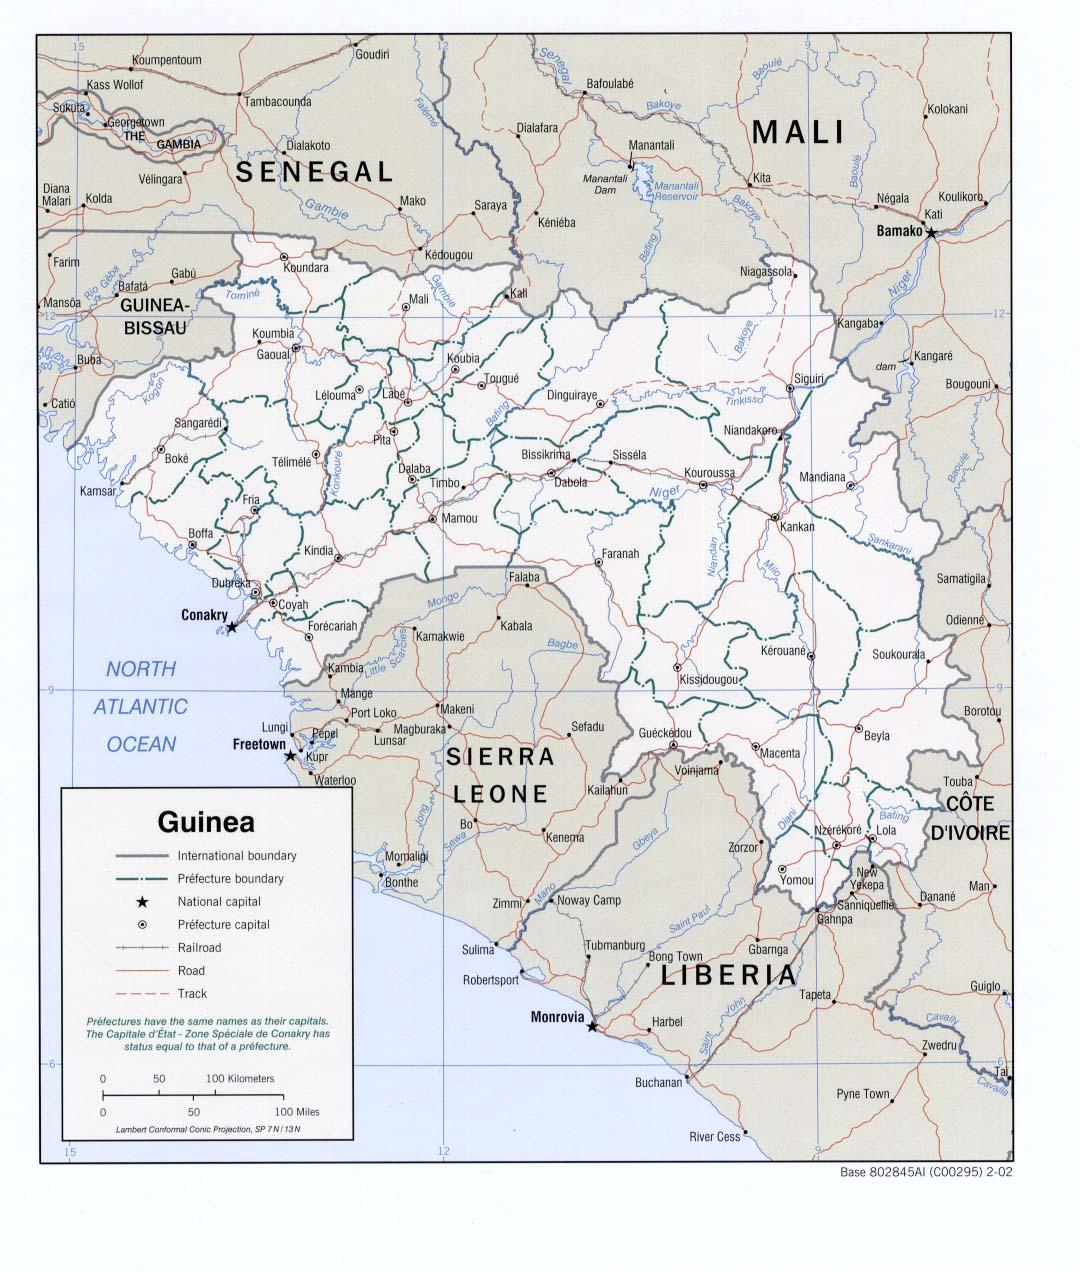 Mapa Politico de Guinea